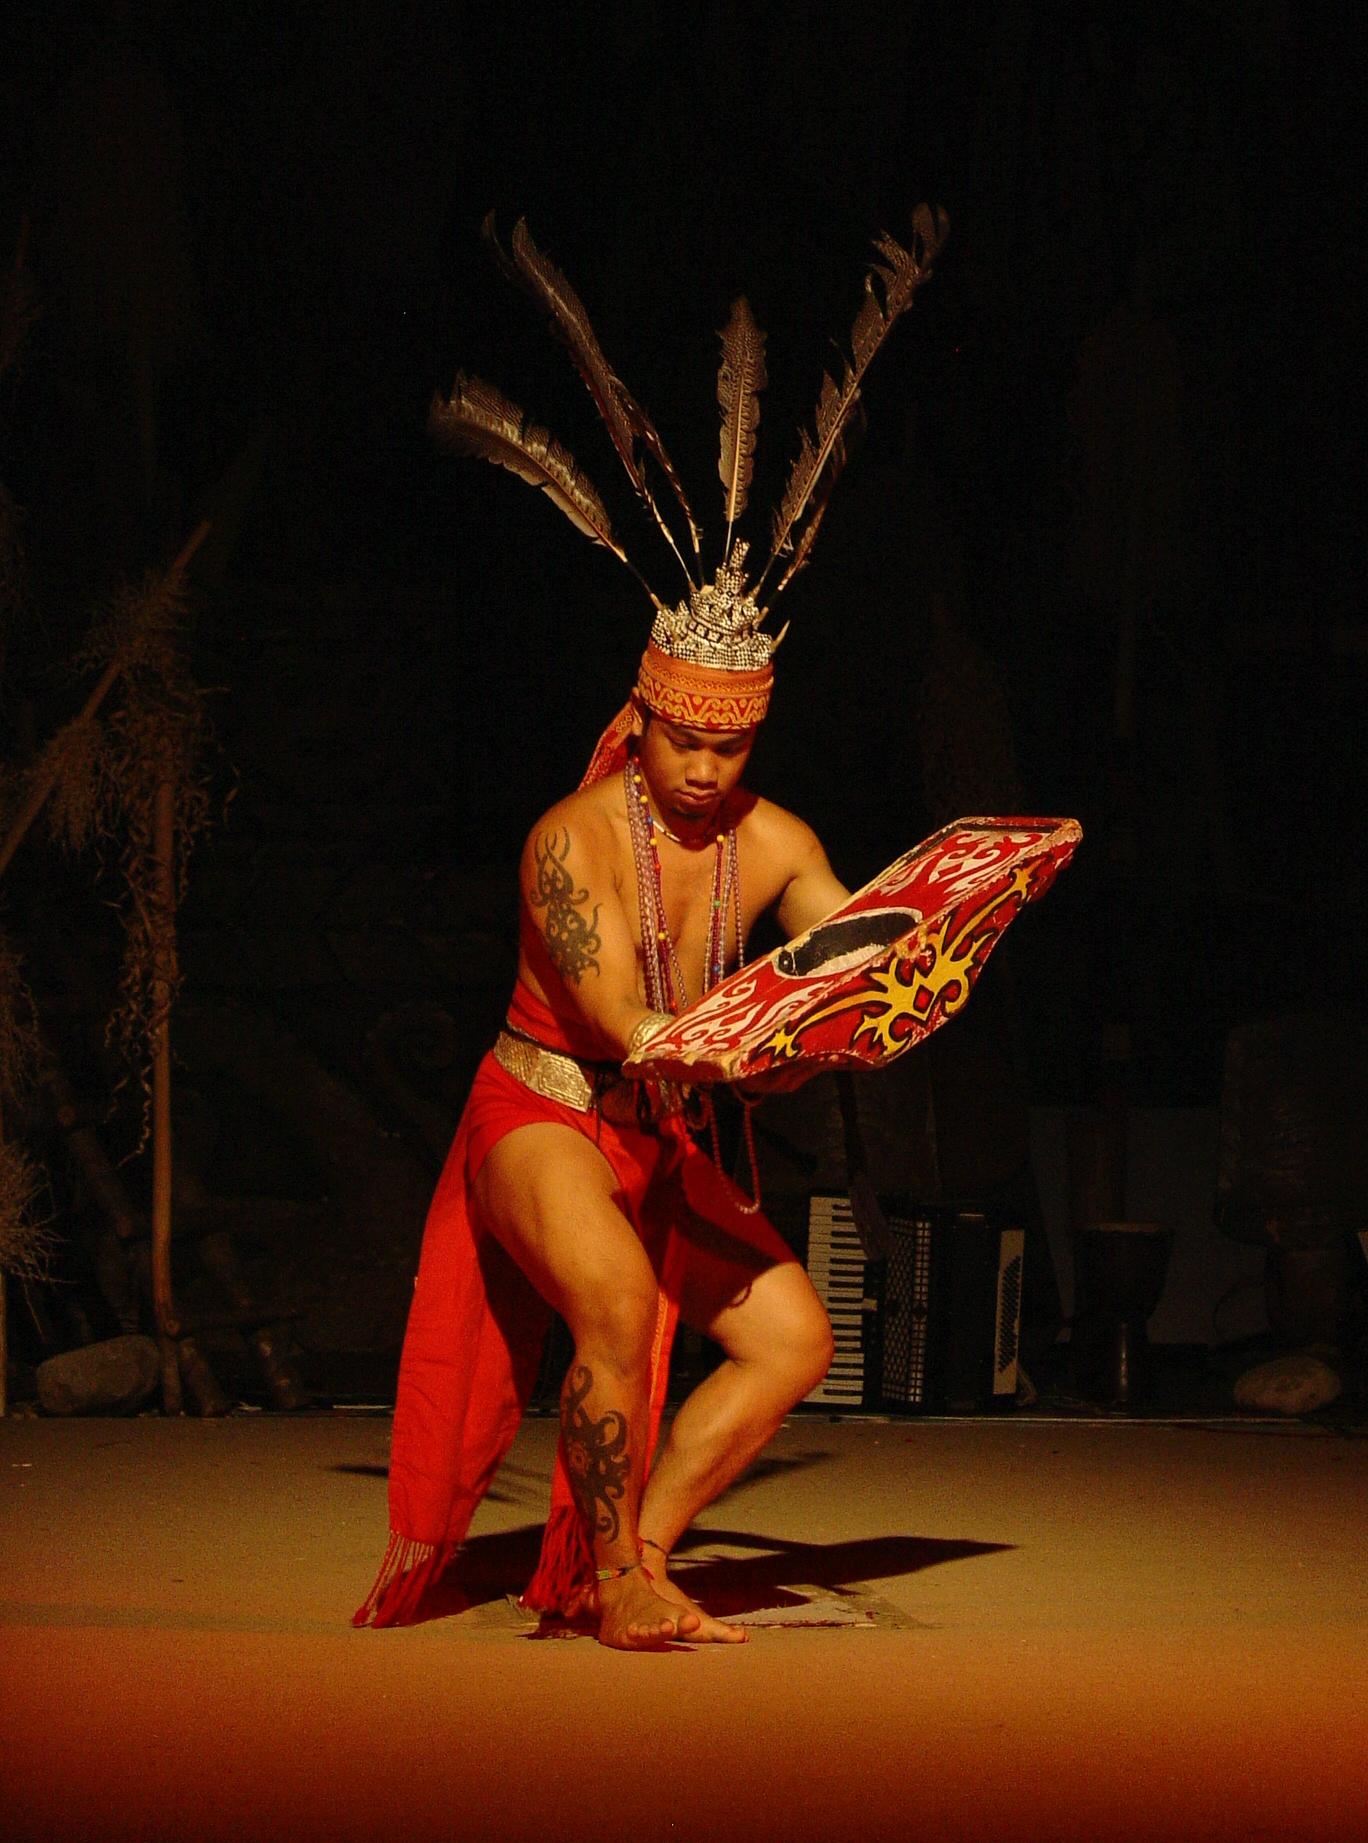 borneo_iban-dance-1532001